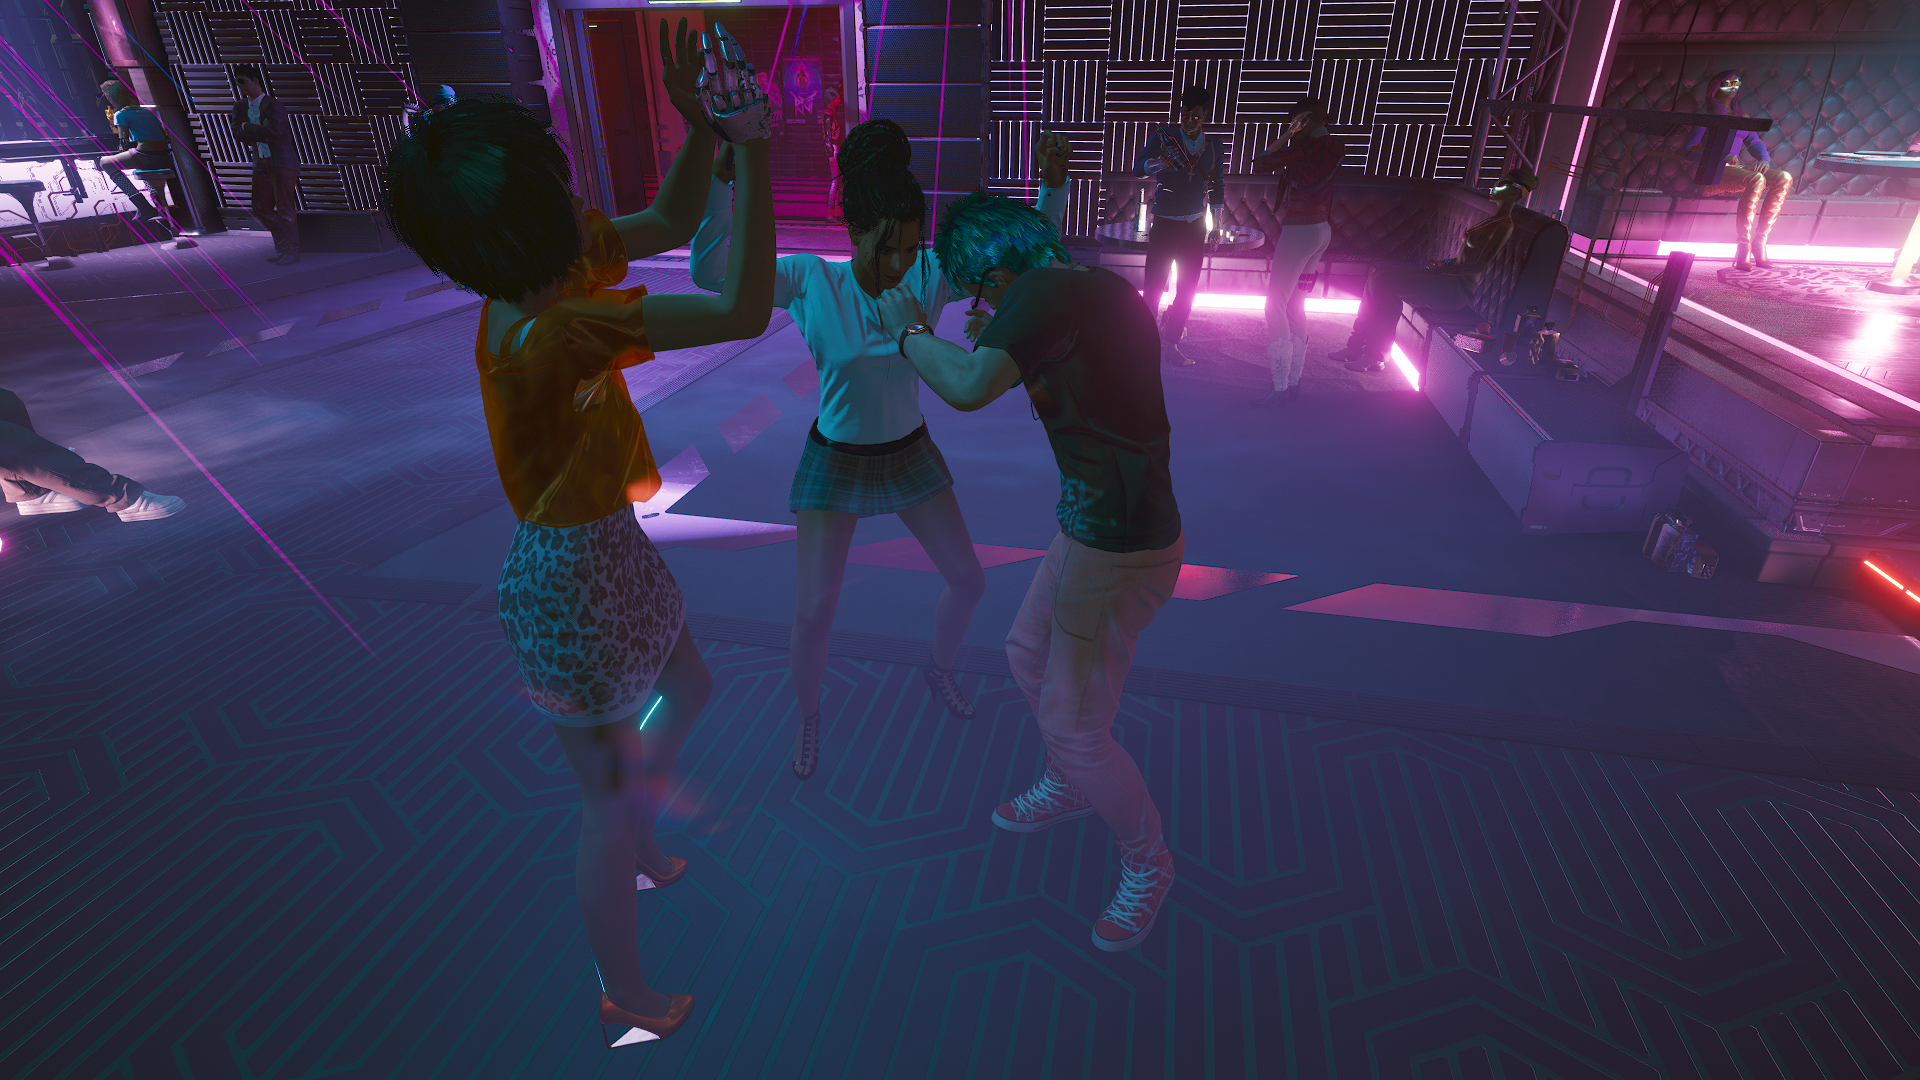 Панам танцует в баре «Лиззис».